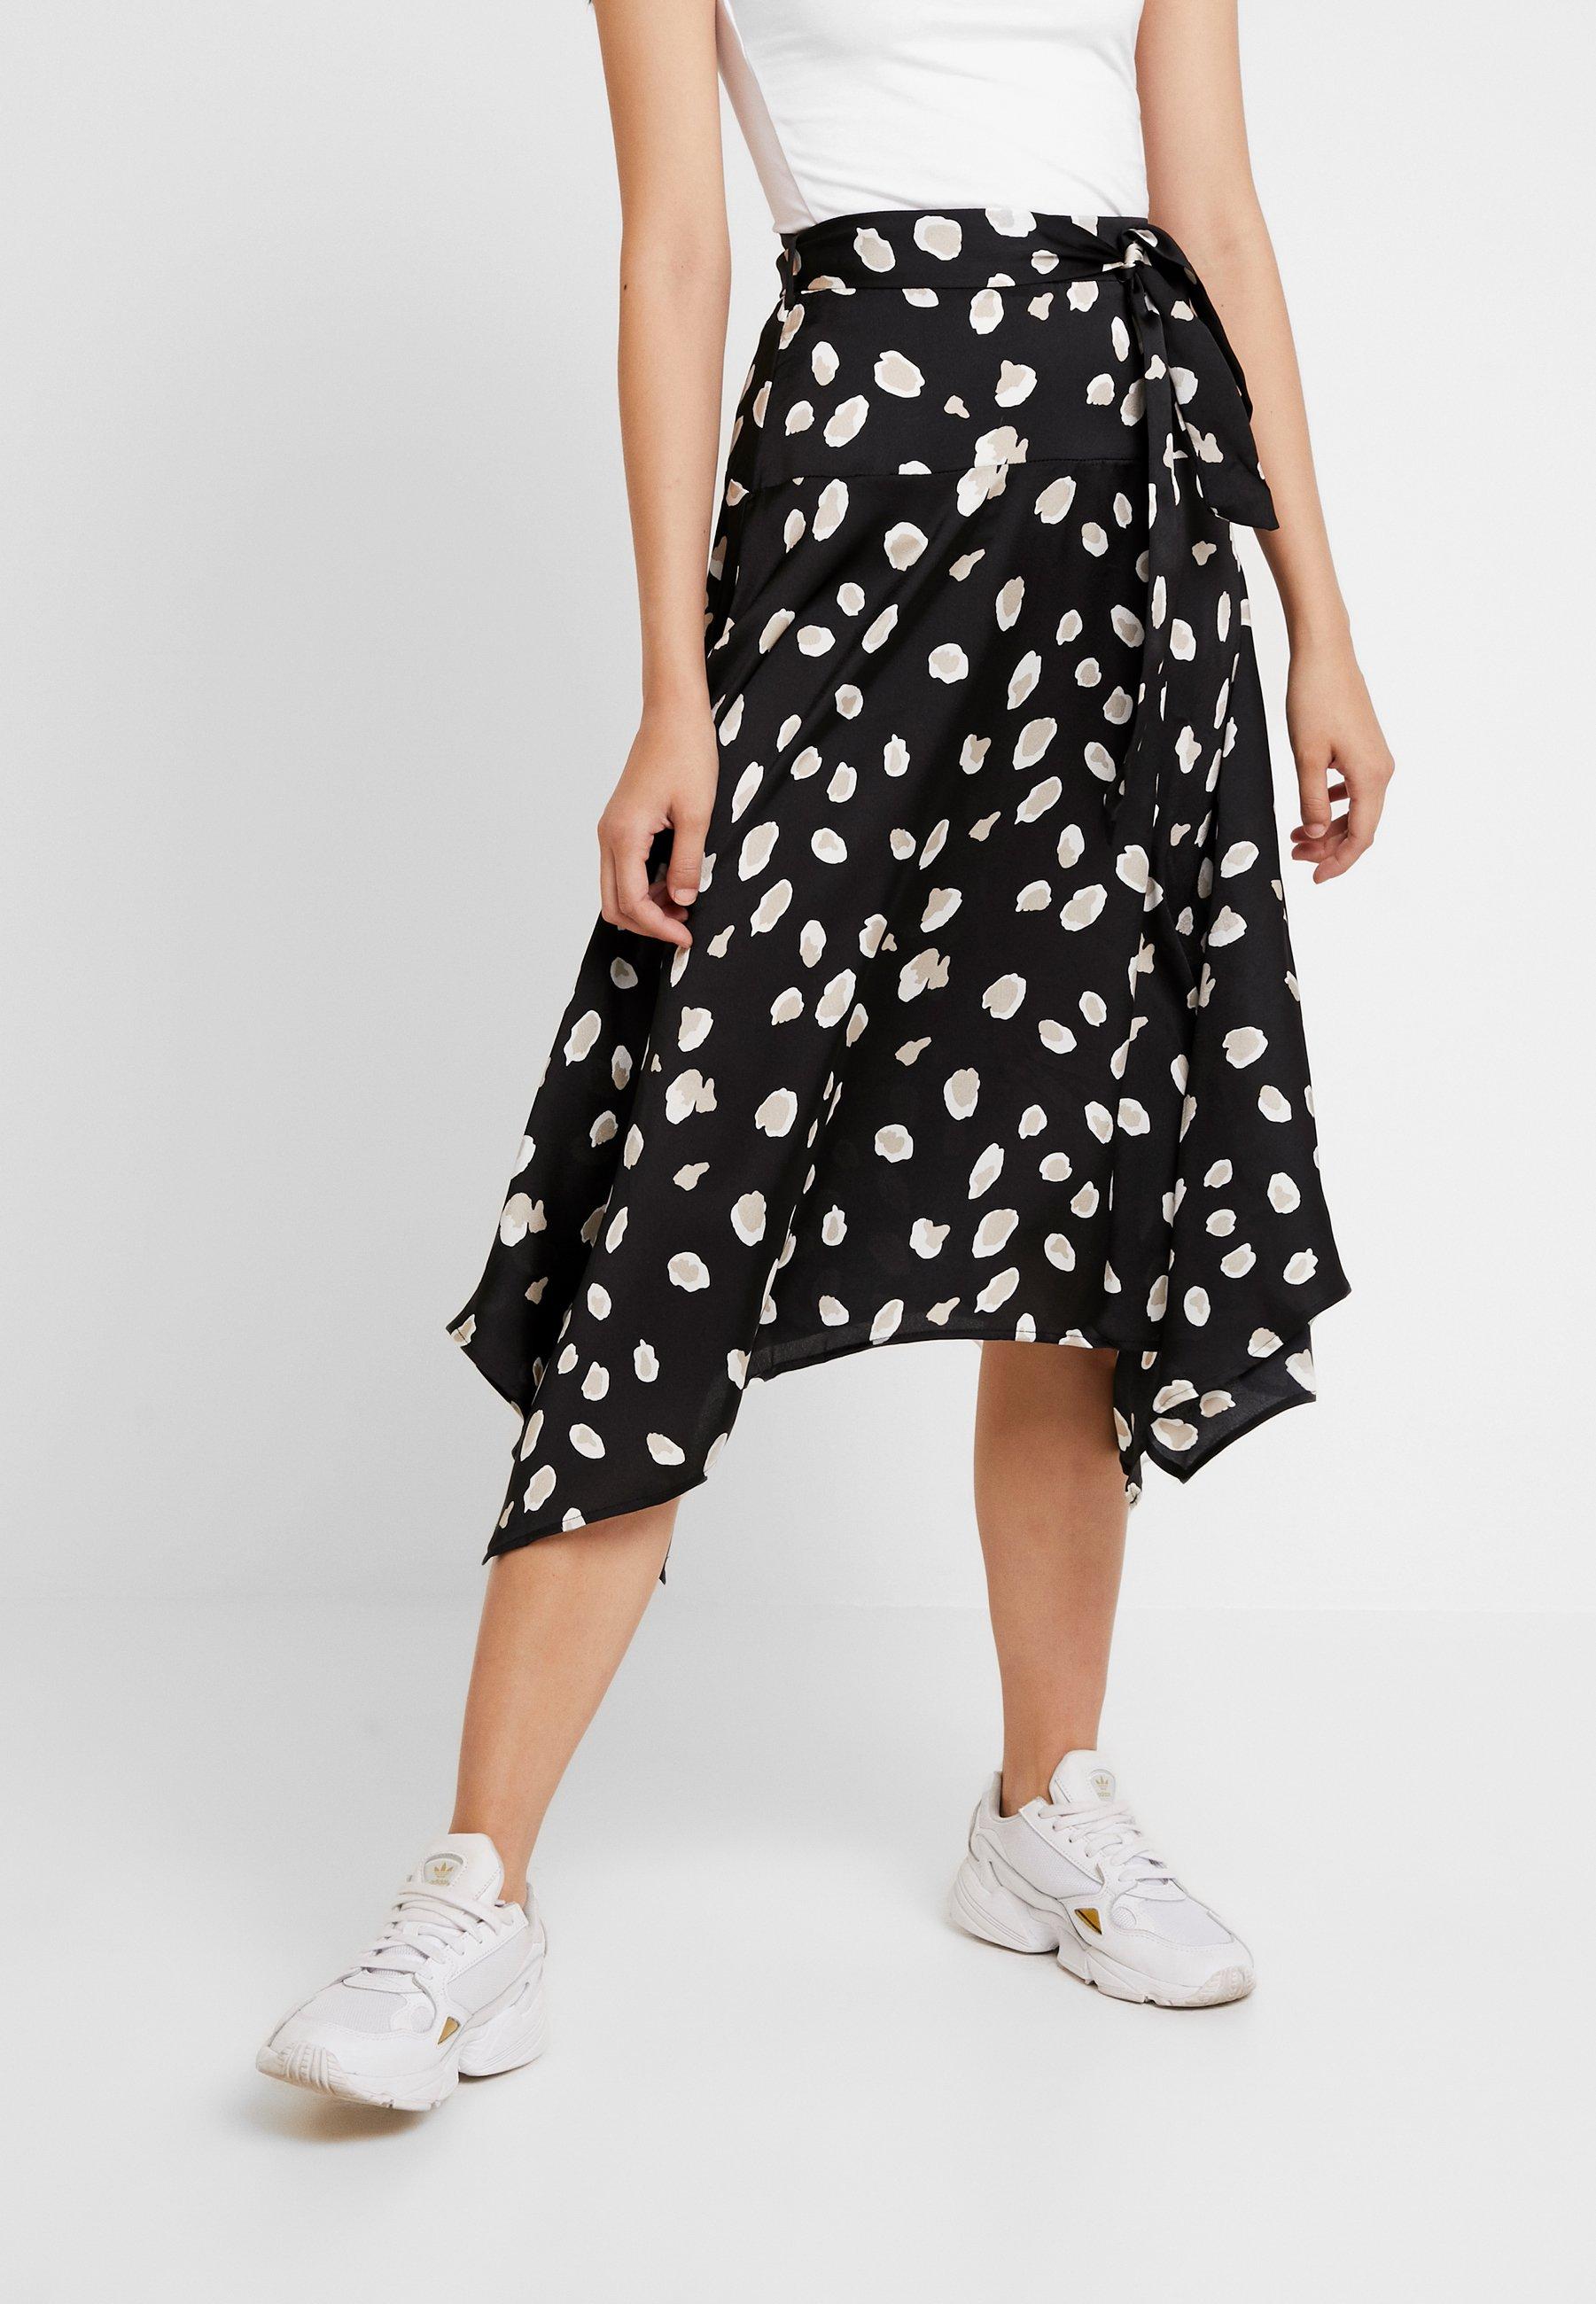 Black SkirtJupe kd Frill Dot Na Trapèze 3jqcLAR54S